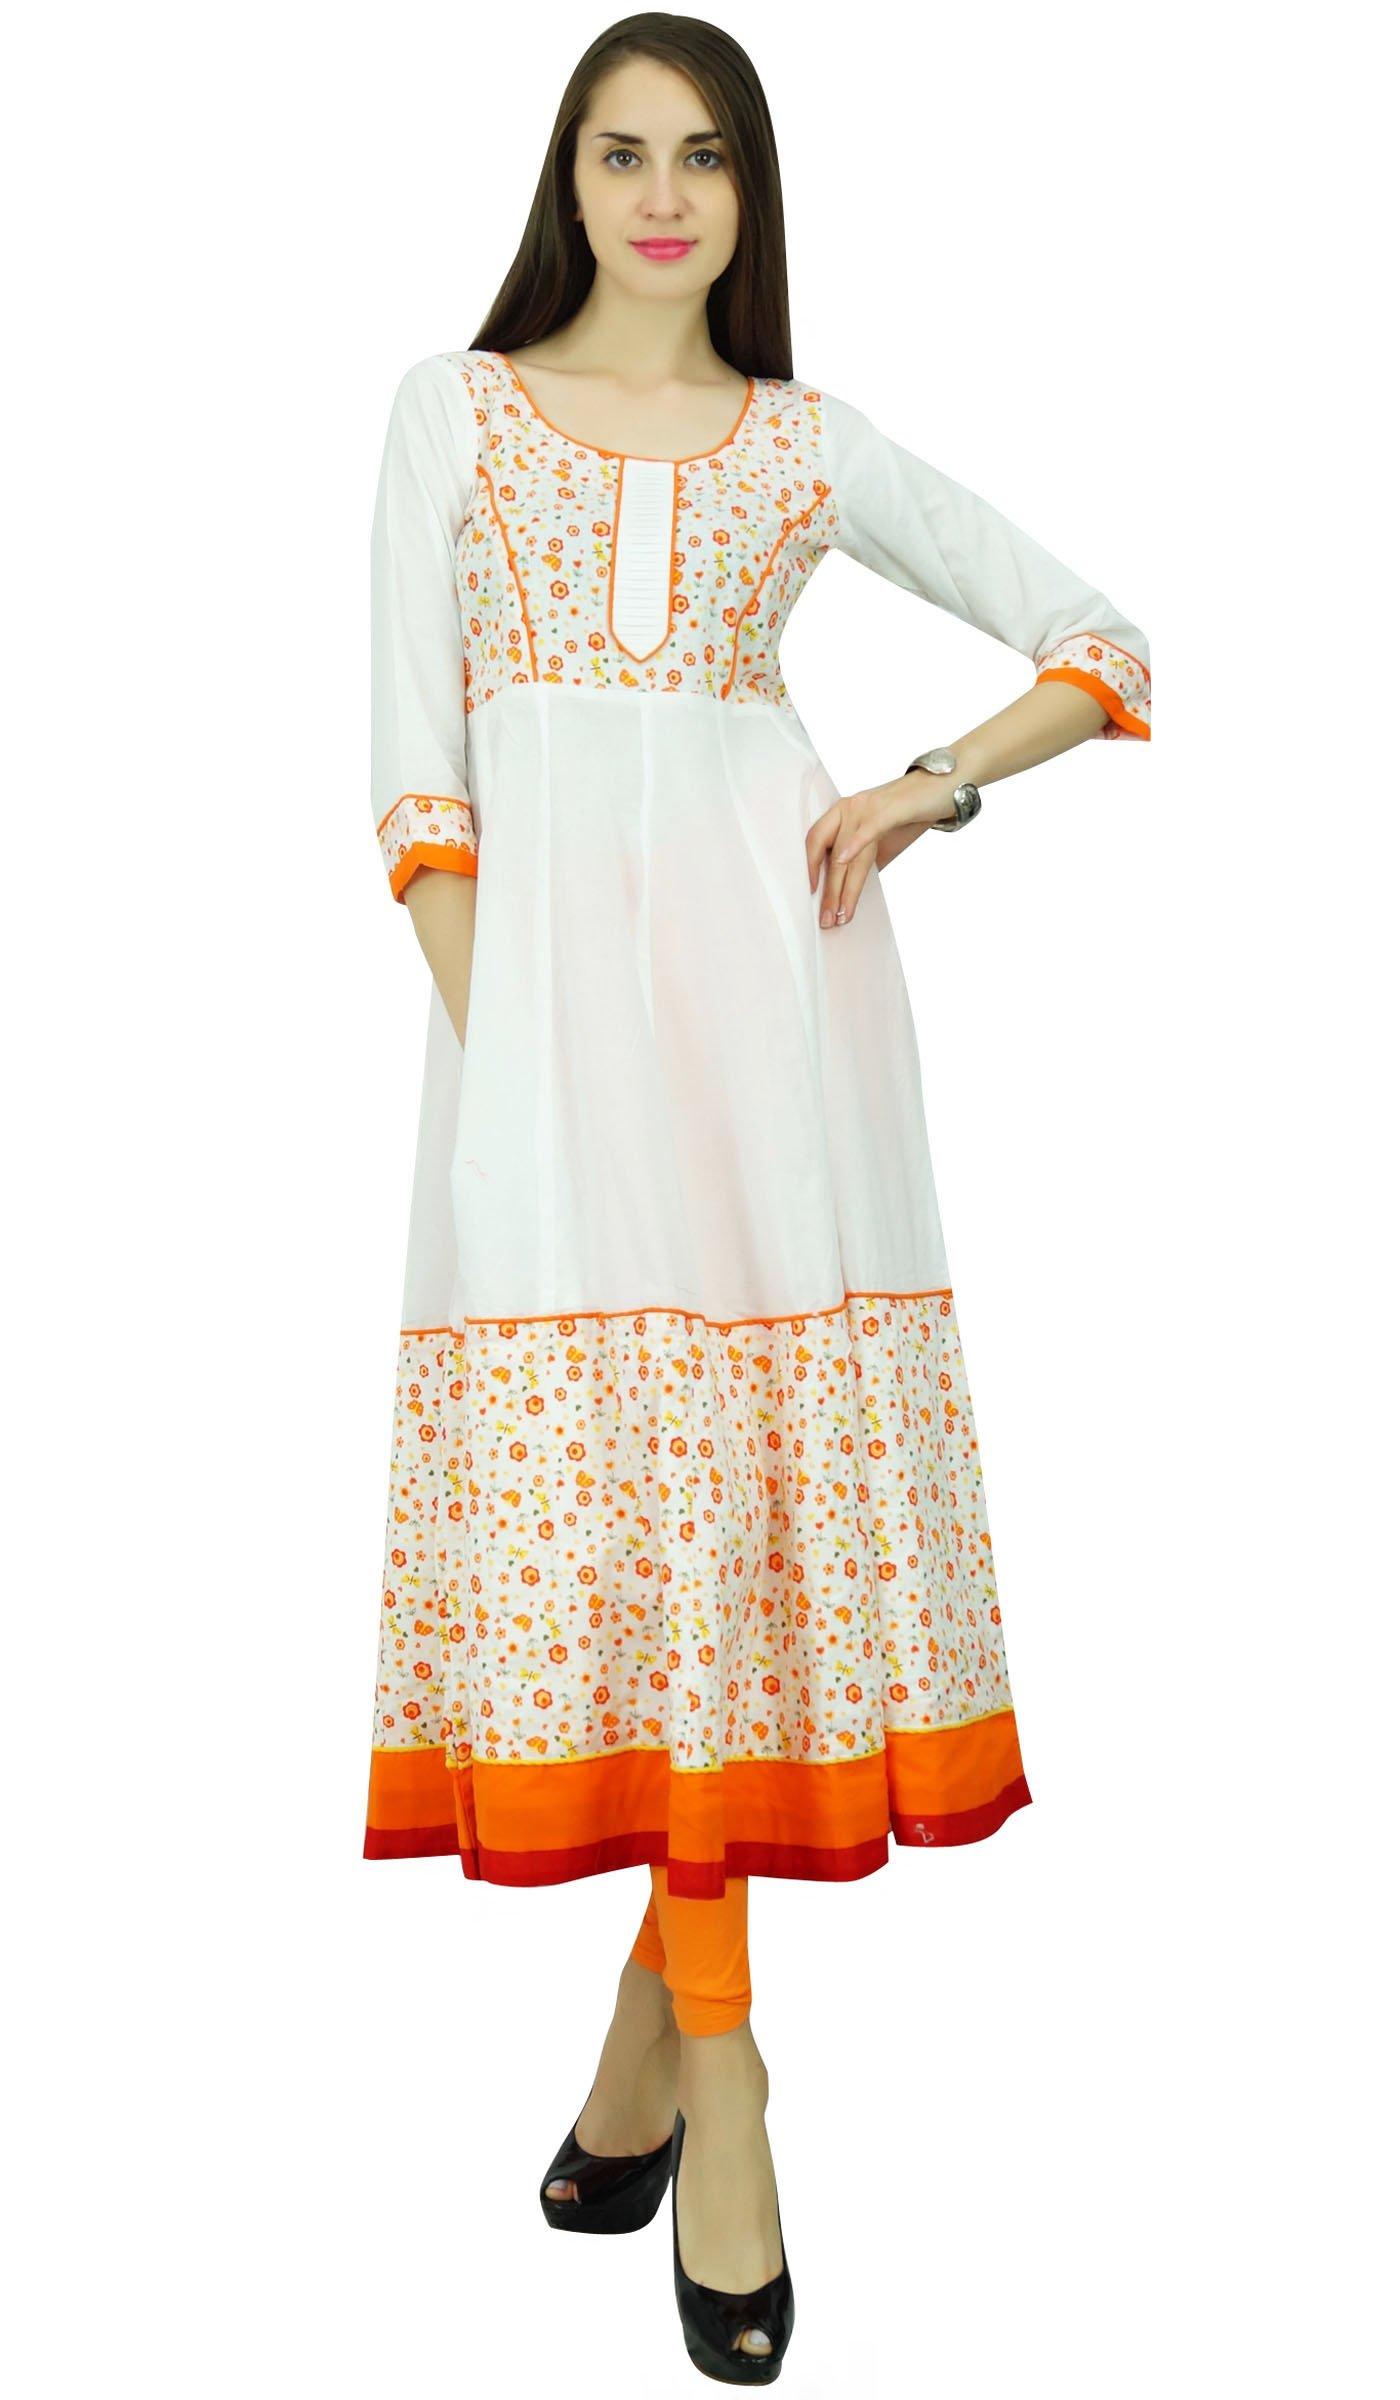 Phagun Paisley Print Cotton Kurta Anarkali Ethnic Kurti Designer Dress